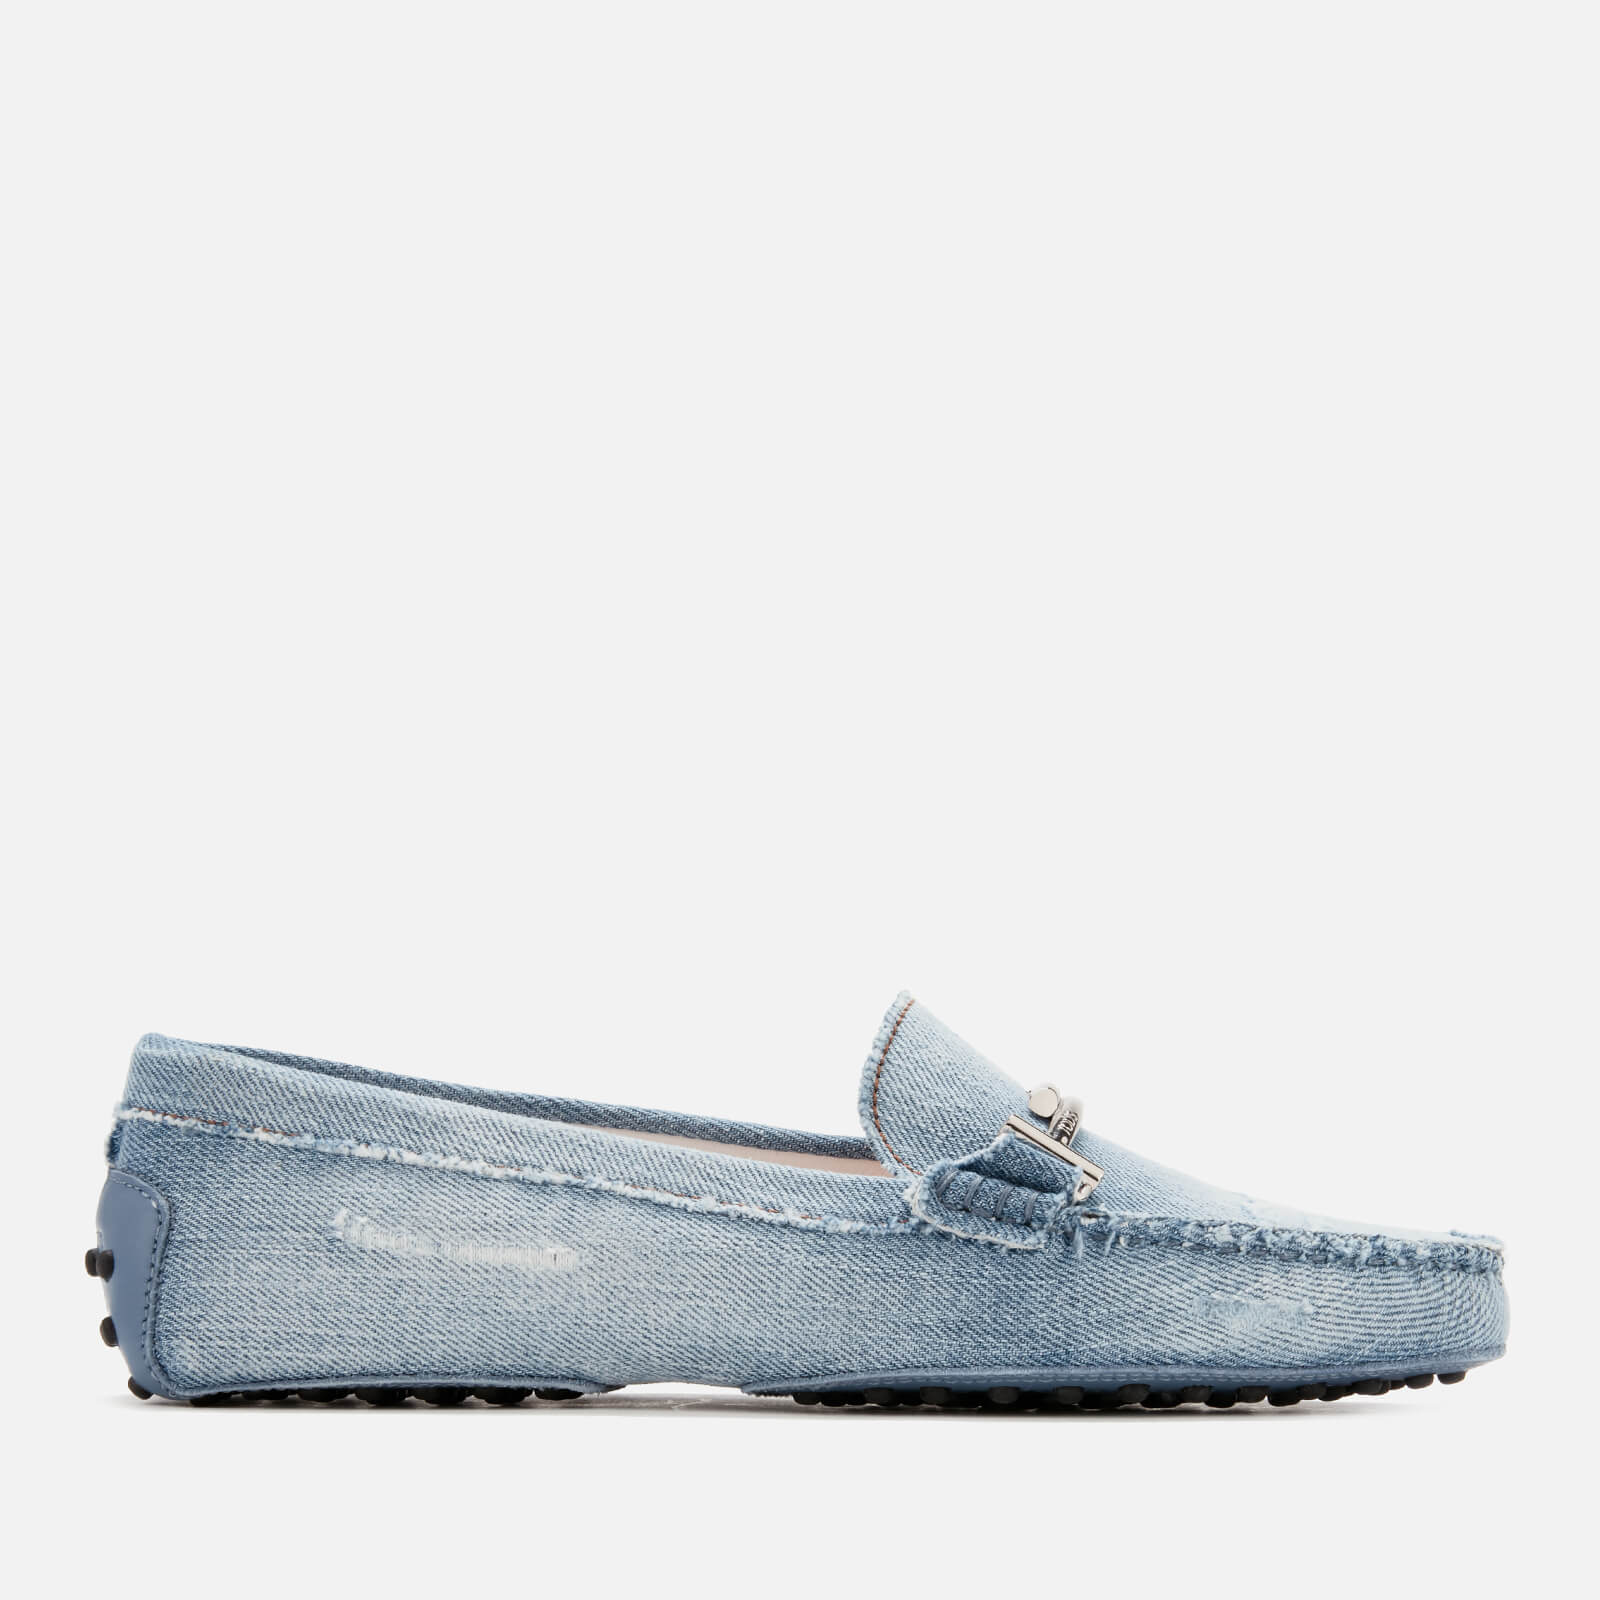 2a8930abfcb Tod s Women s Gommino Denim Driving Shoes - Light Denim - Free UK ...